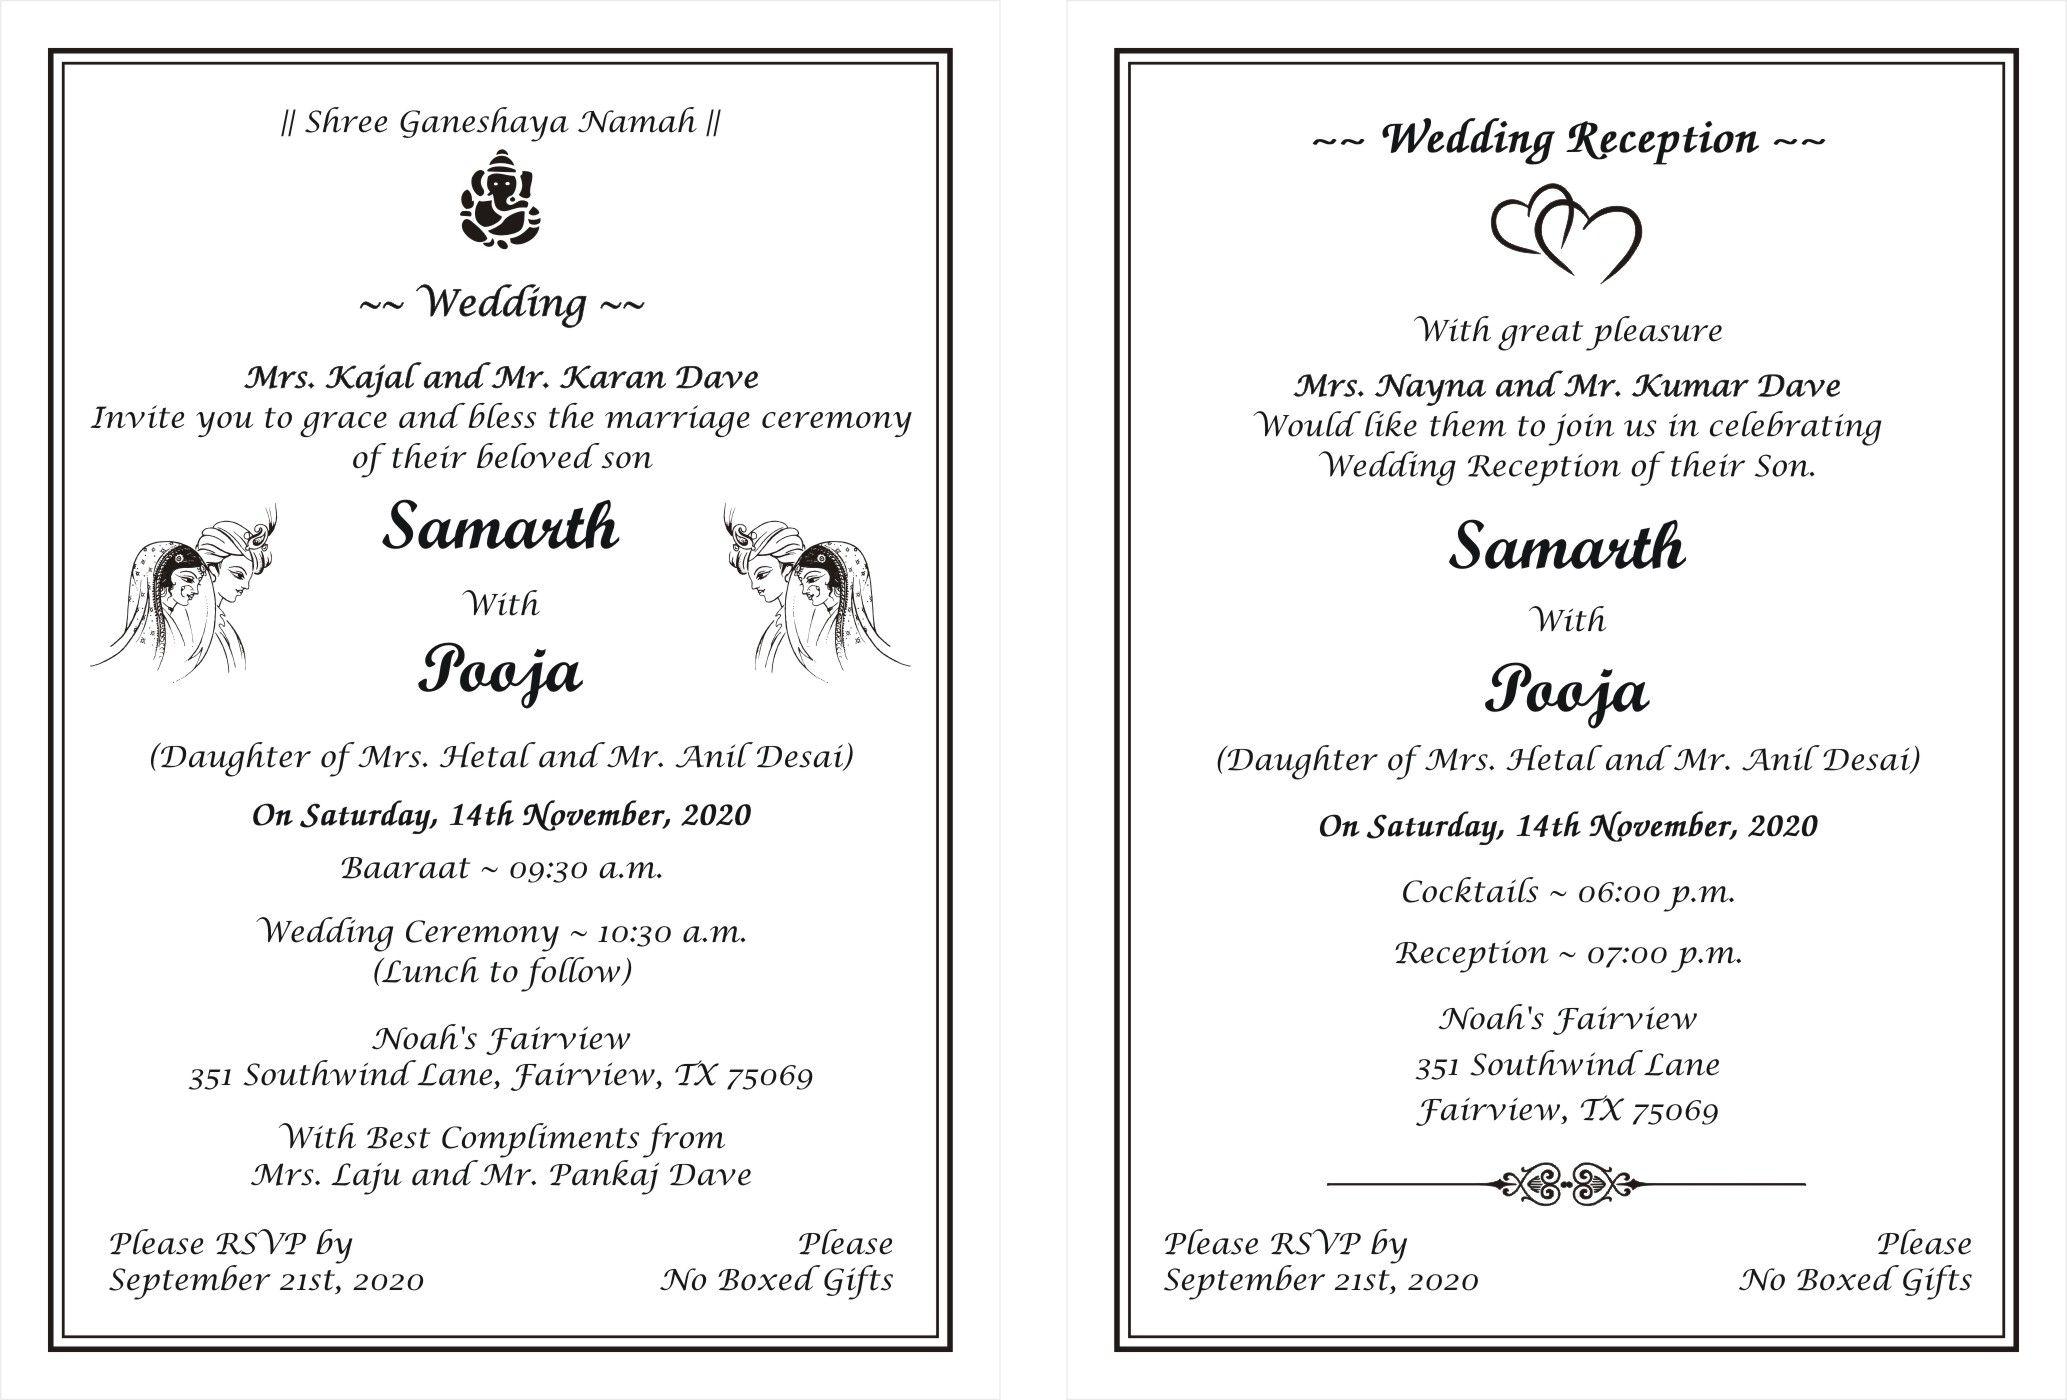 Hindu Wedding Invitation Card Wordings (With images